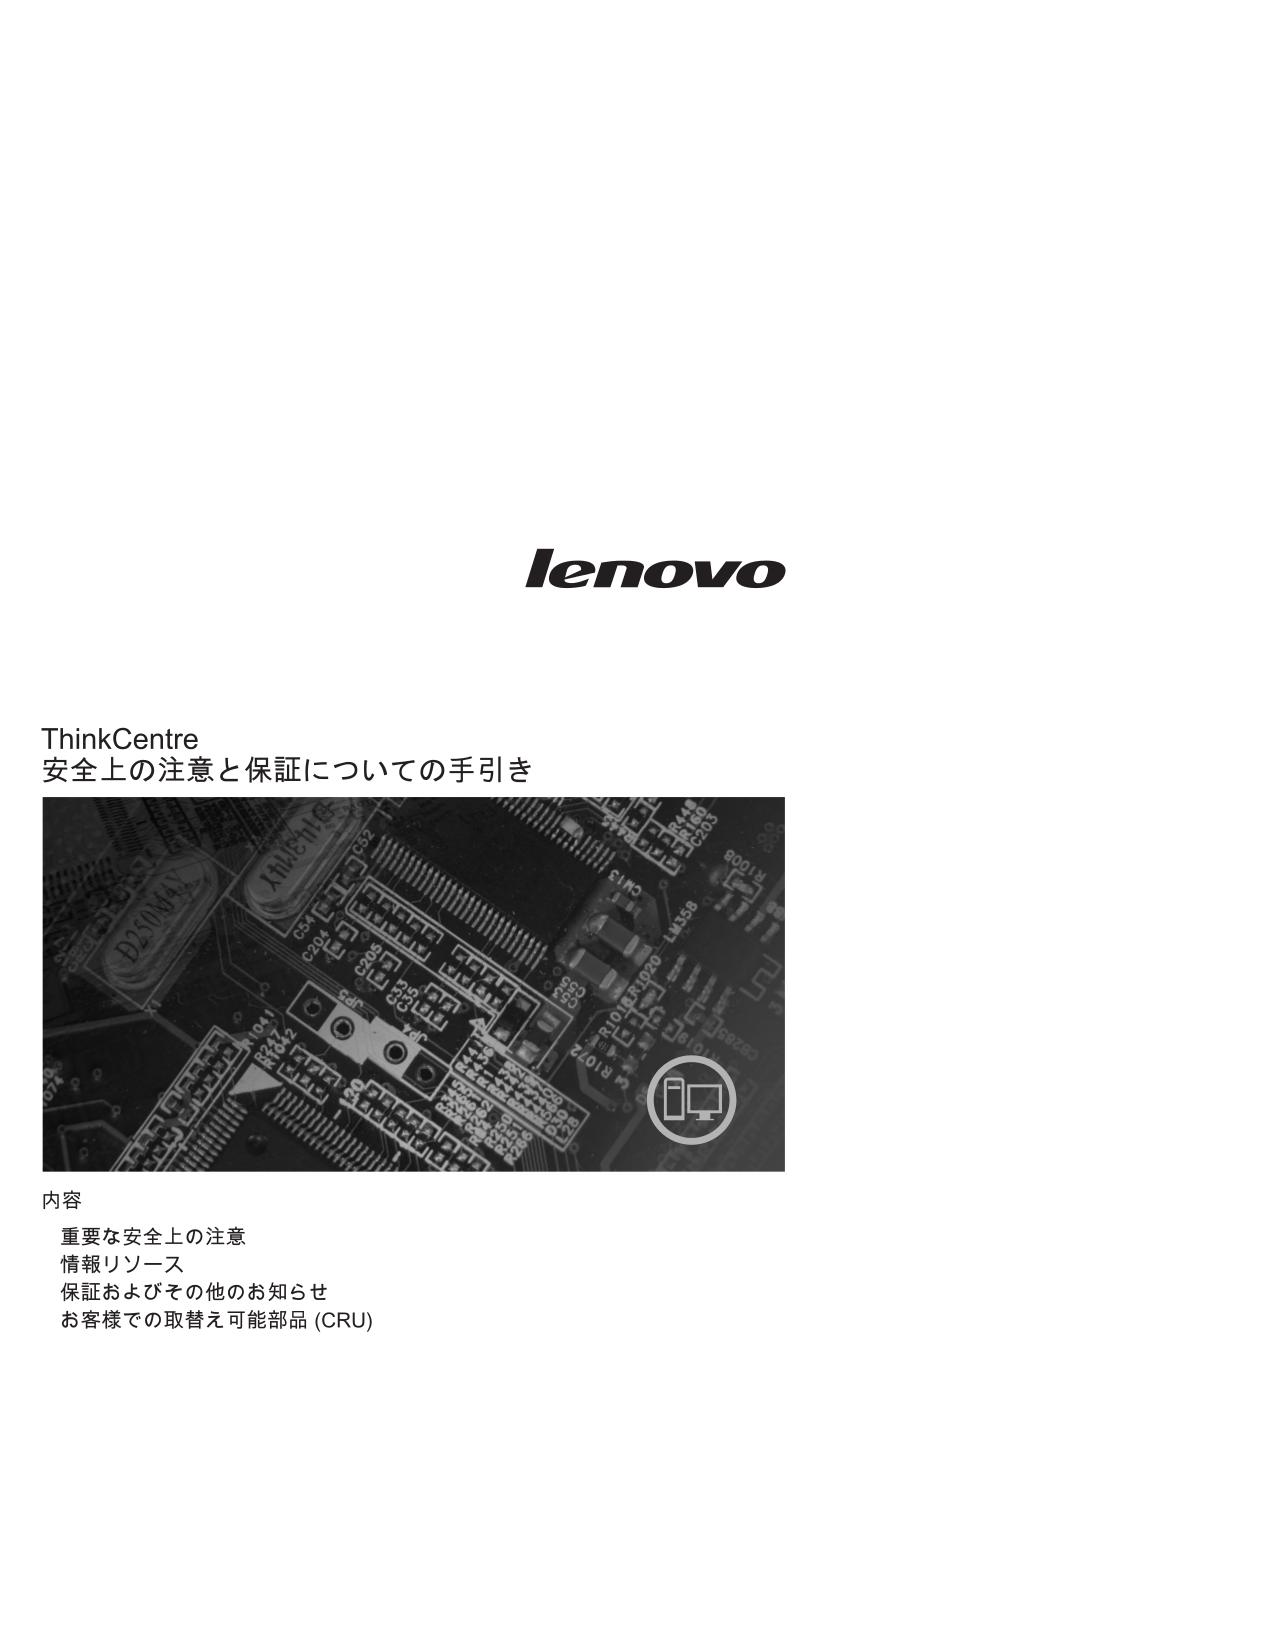 pdf for Lenovo Desktop ThinkCentre A61 9159 manual